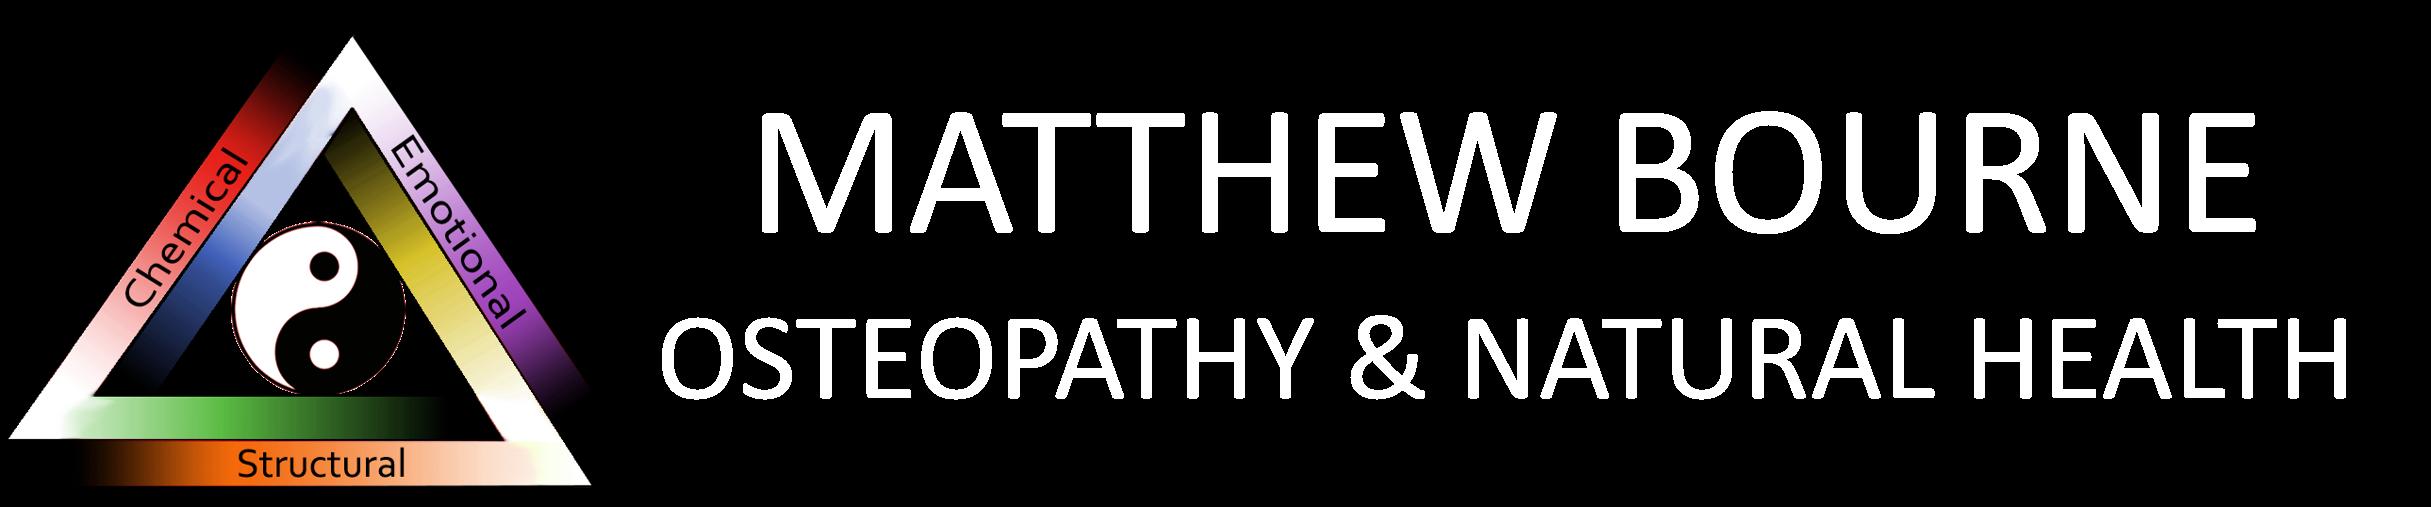 Matthew Bourne Osteopathy & Natural Health